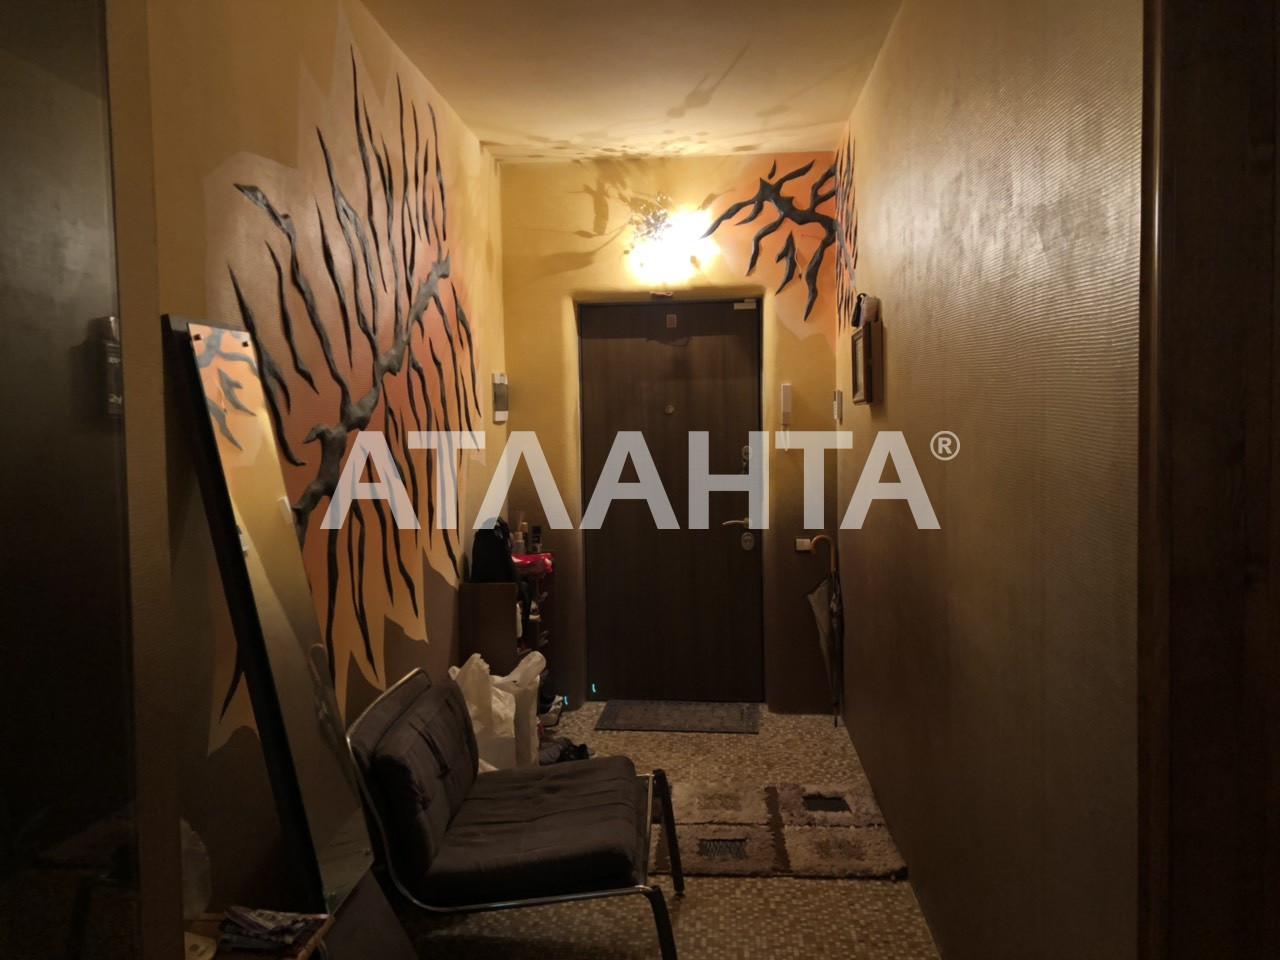 Продается 3-комнатная Квартира на ул. 1 Мая — 135 000 у.е. (фото №15)